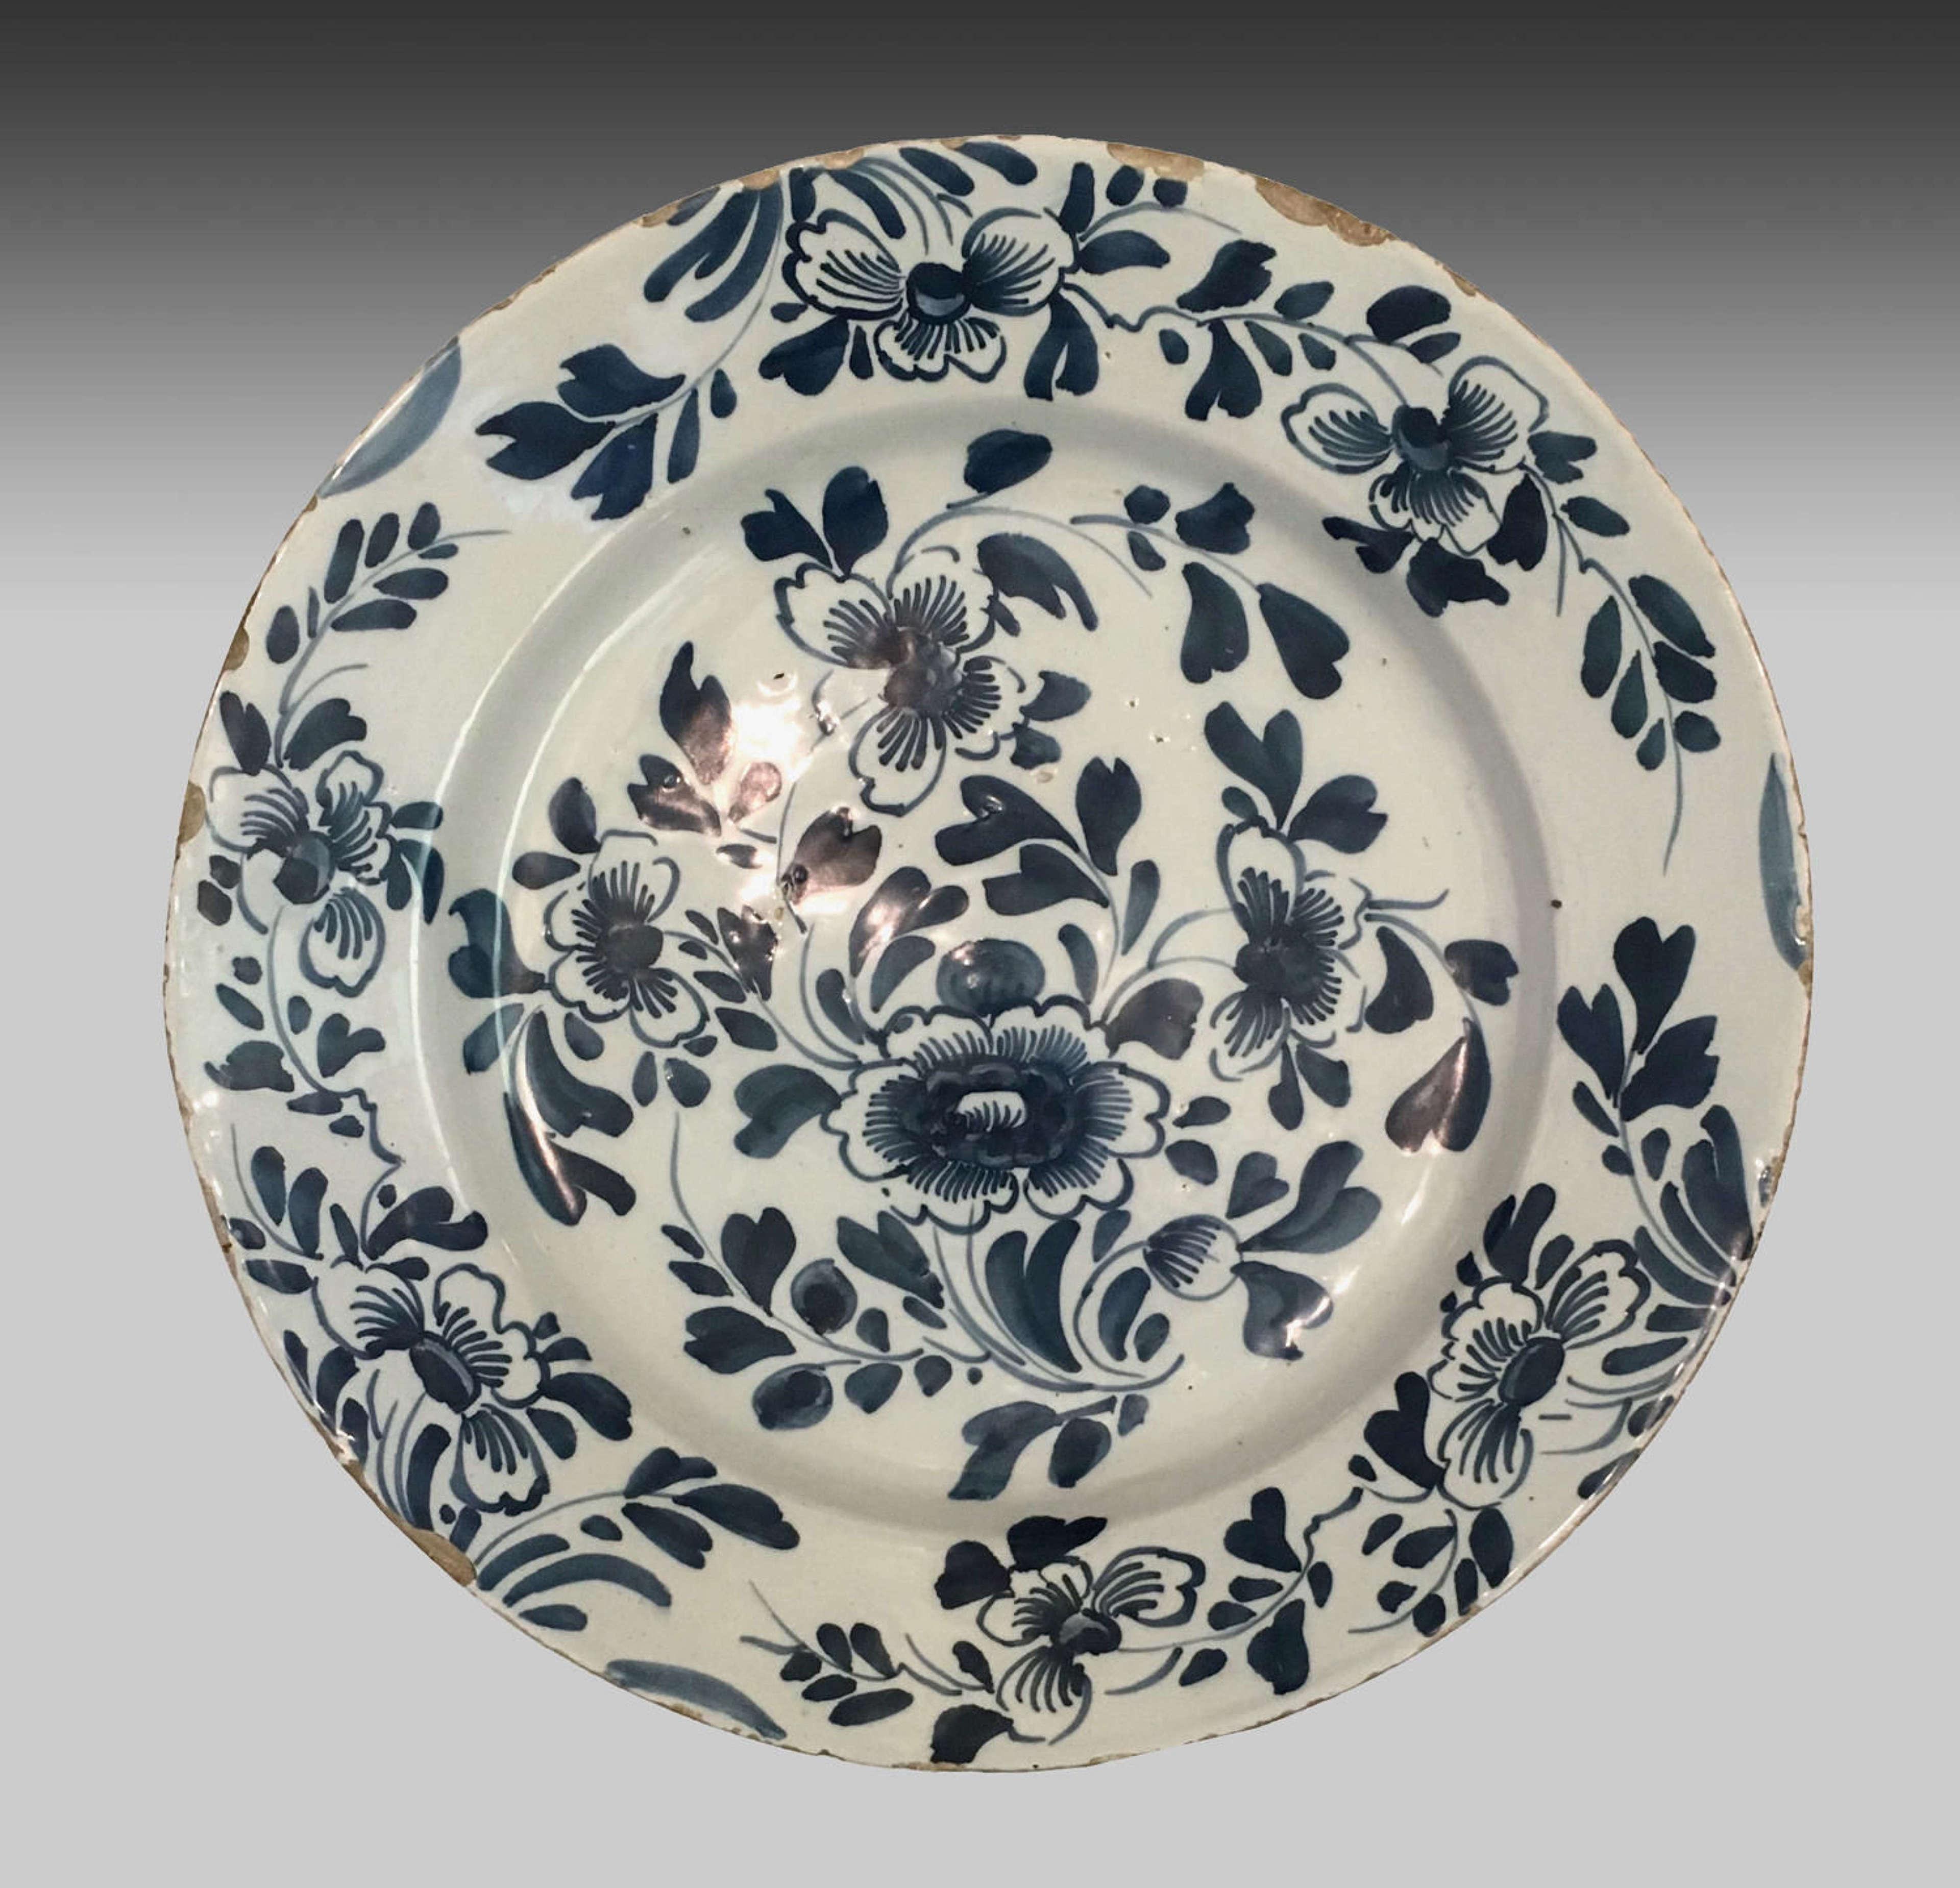 Fine antique 18th century blue and white Delft plate